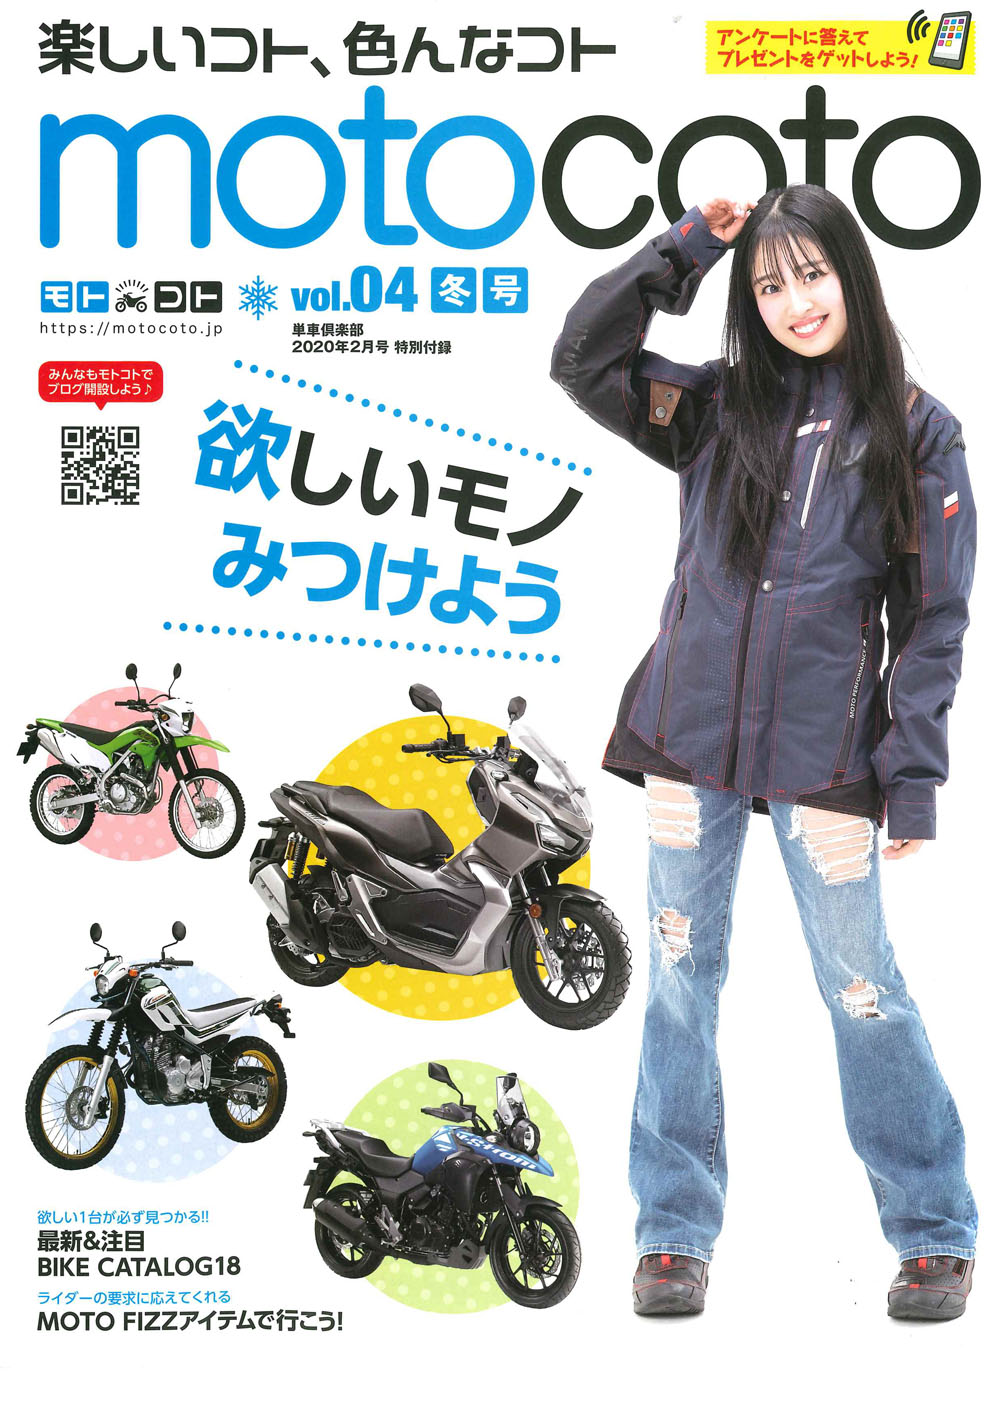 【motocoto vol.04冬号掲載】 B+COMヘルメット取り付け